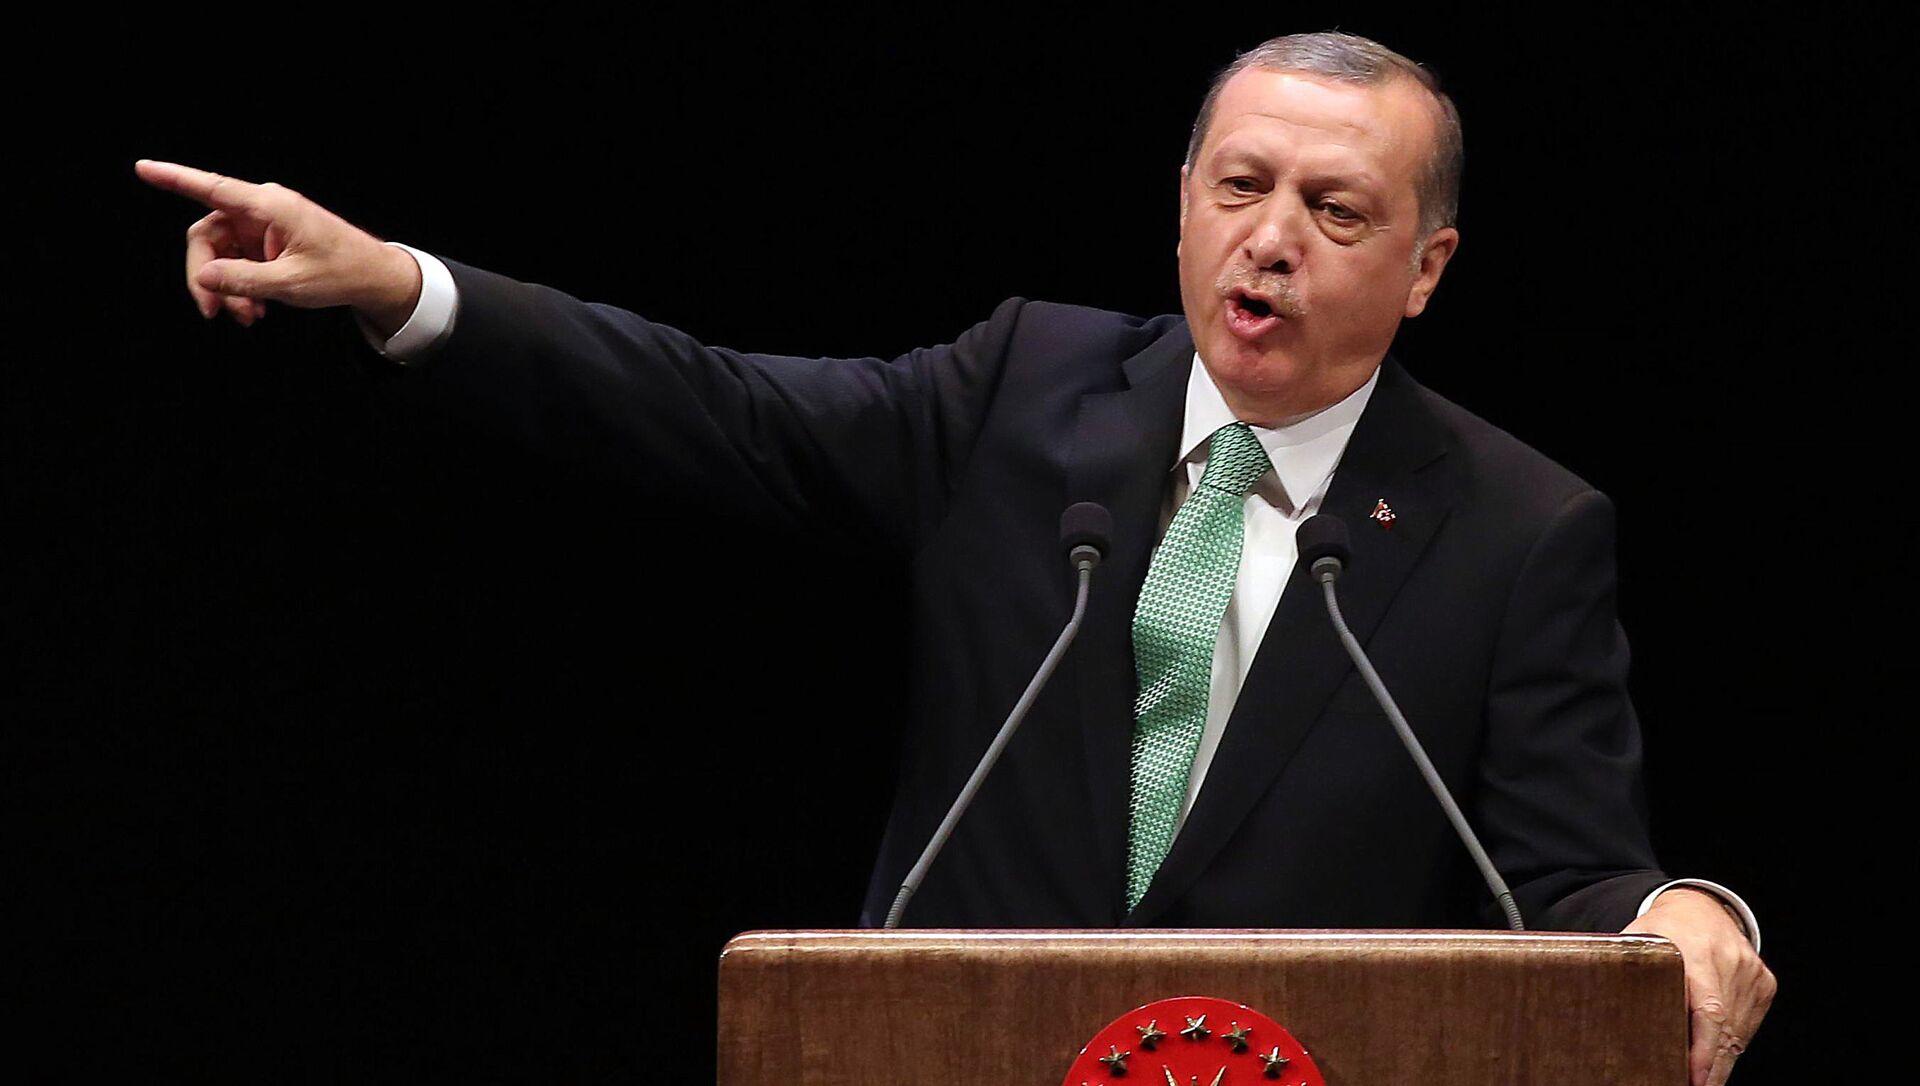 Turecký prezident Recep Tayyip Erdogan - Sputnik Česká republika, 1920, 20.03.2021